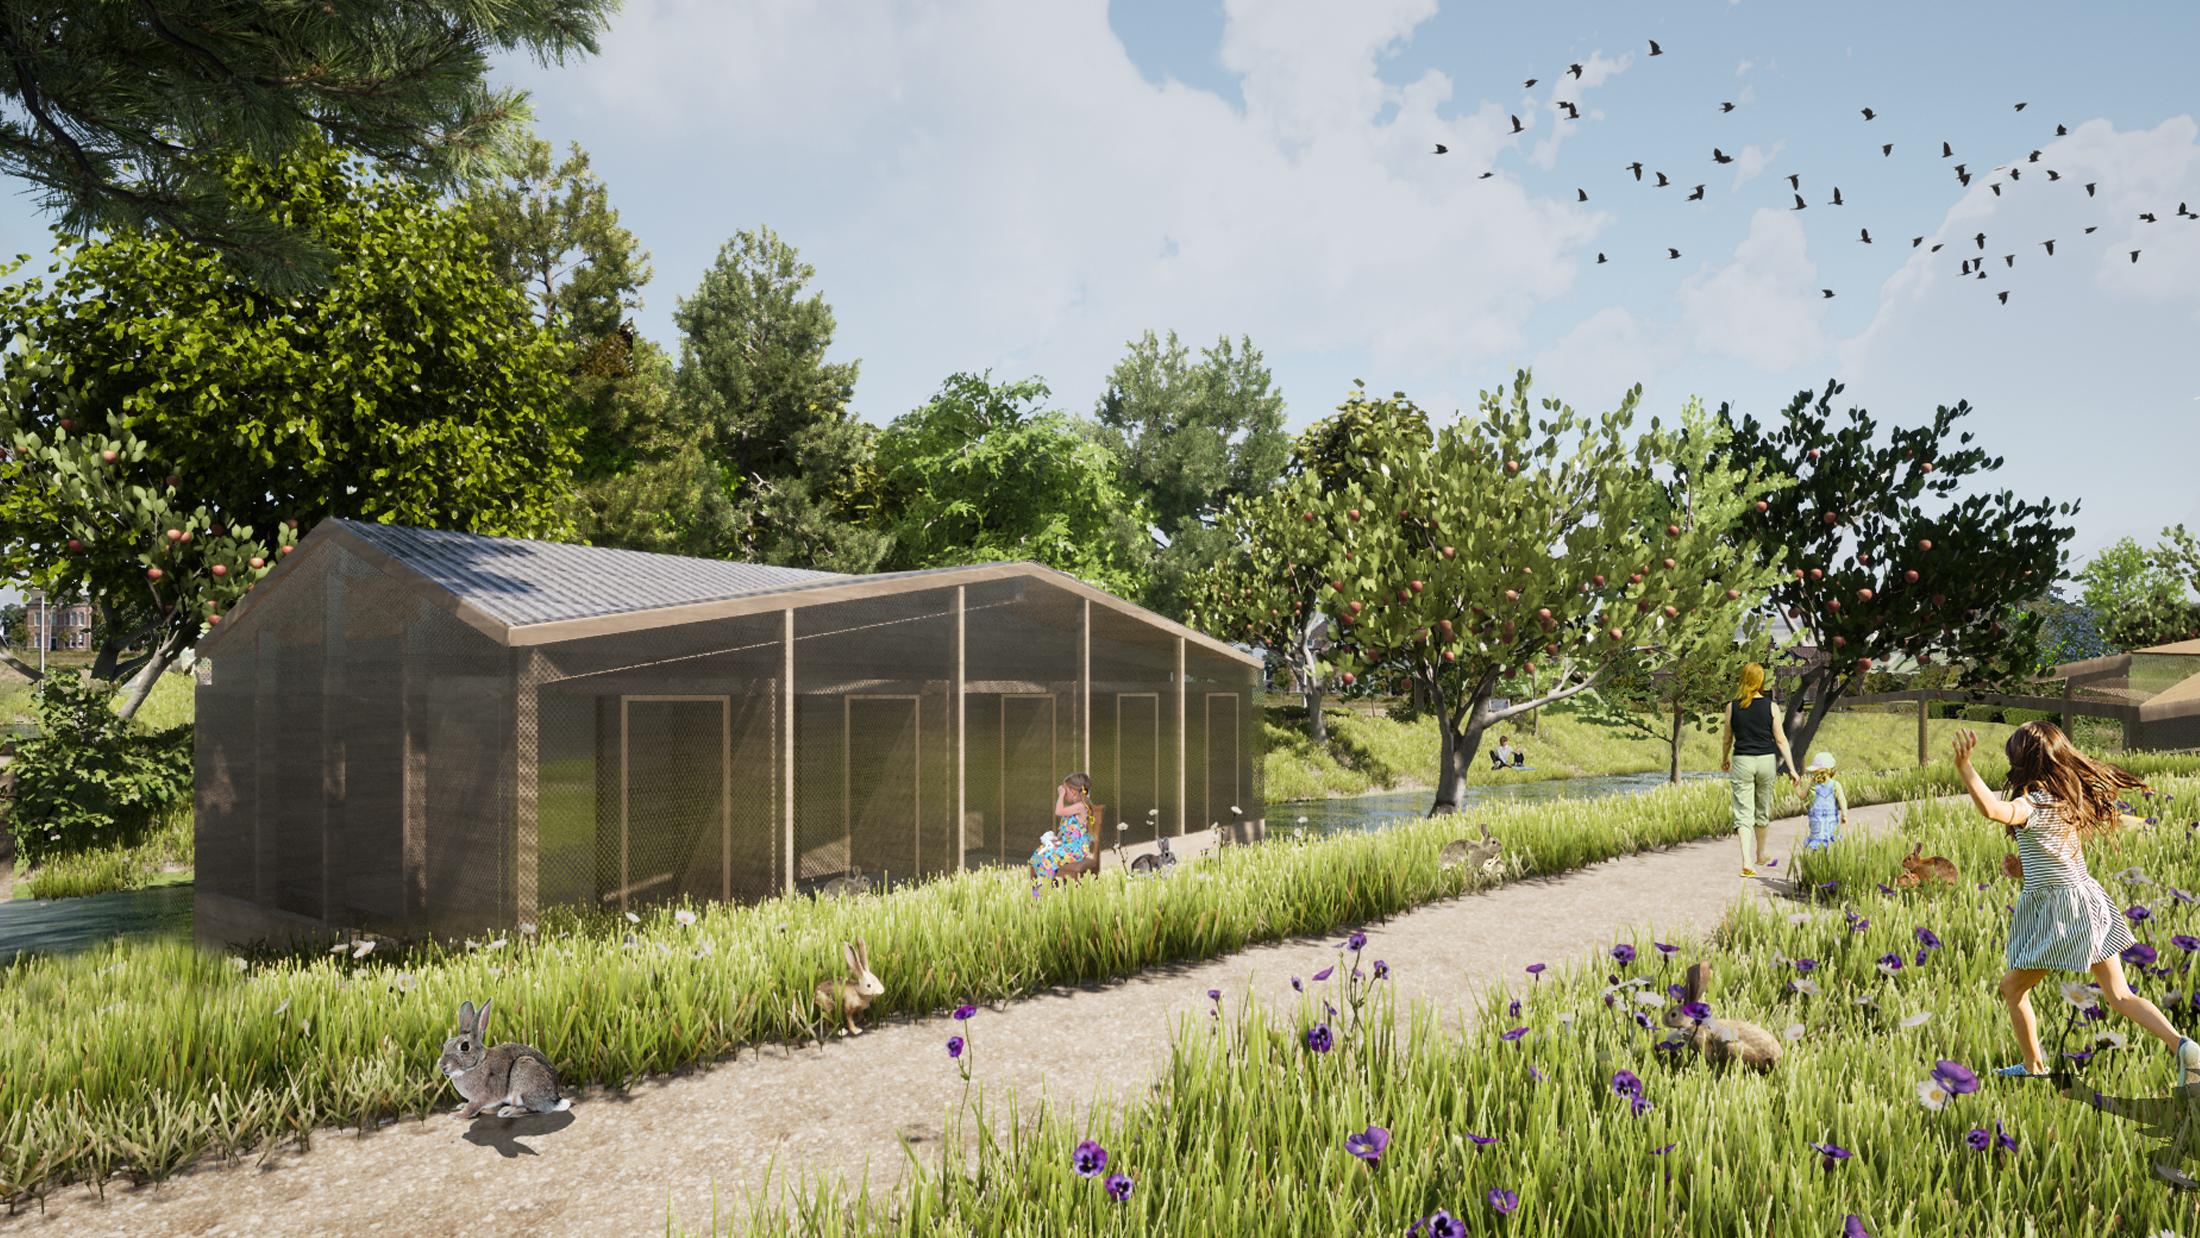 De Dierenhoeve, designed by NOAHH | Network Oriented Architecture